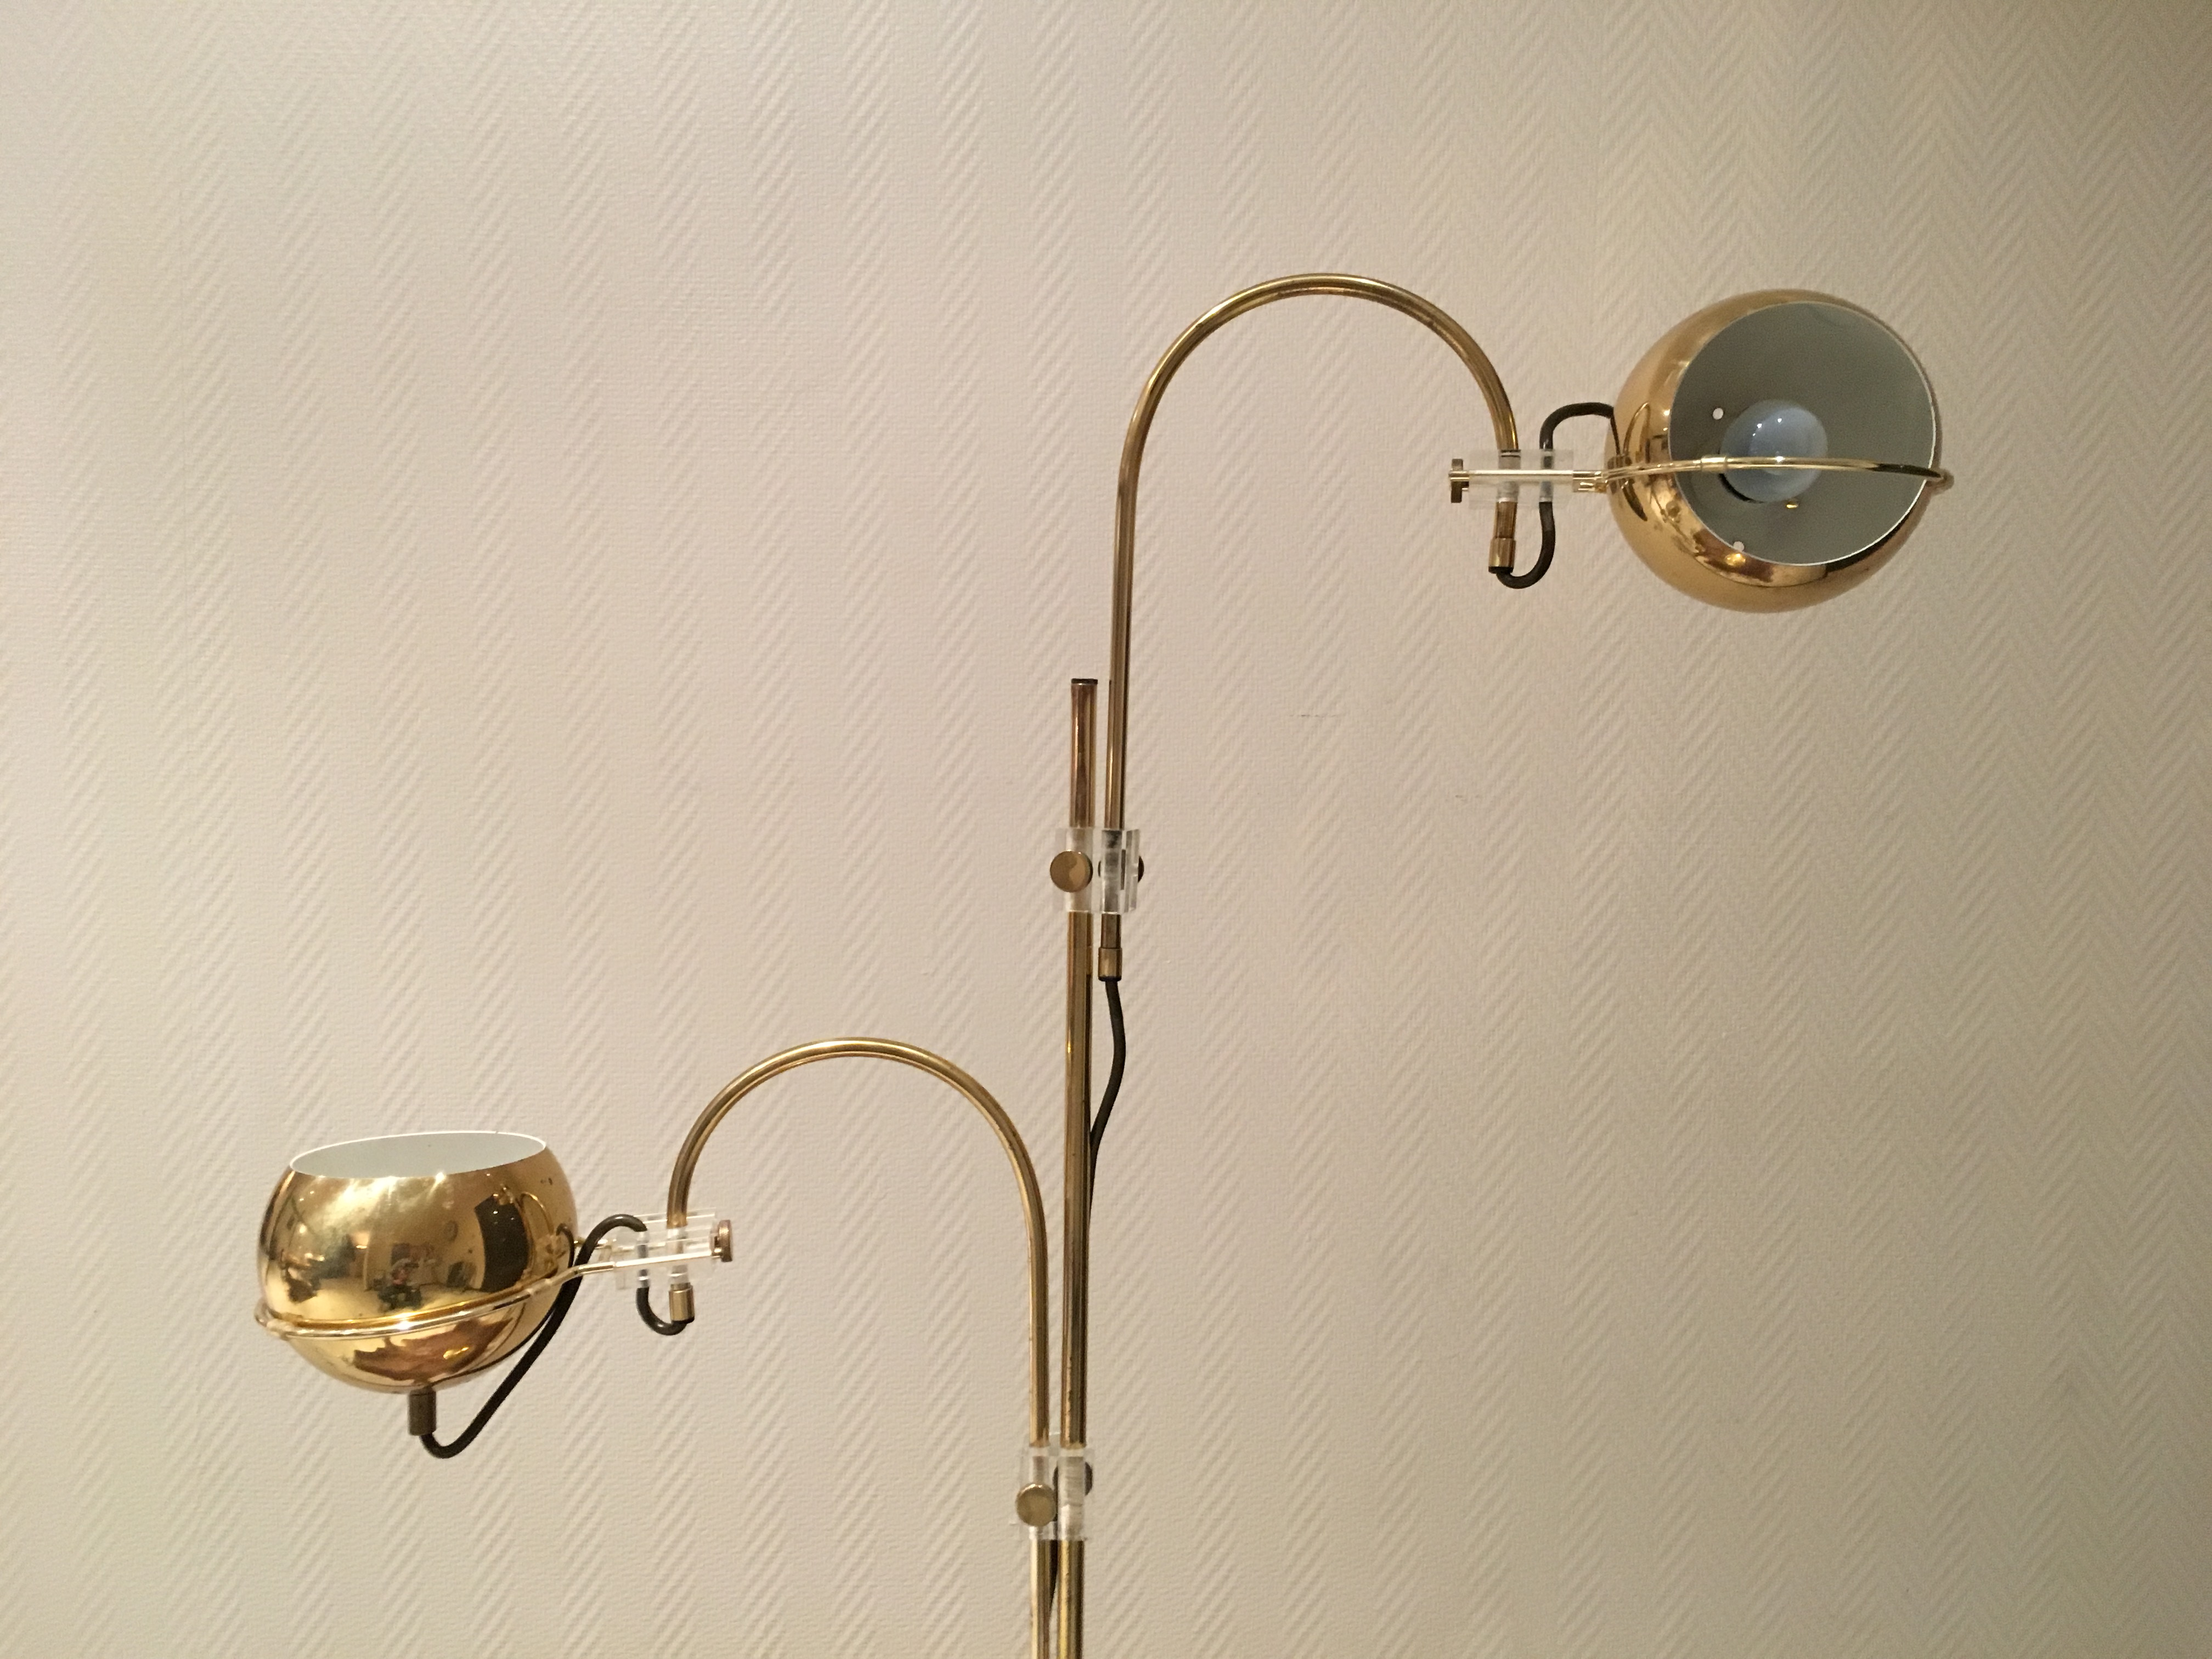 lampadaire laiton plexiglass ann e 70 vintage floor lamp brass design 70 s. Black Bedroom Furniture Sets. Home Design Ideas